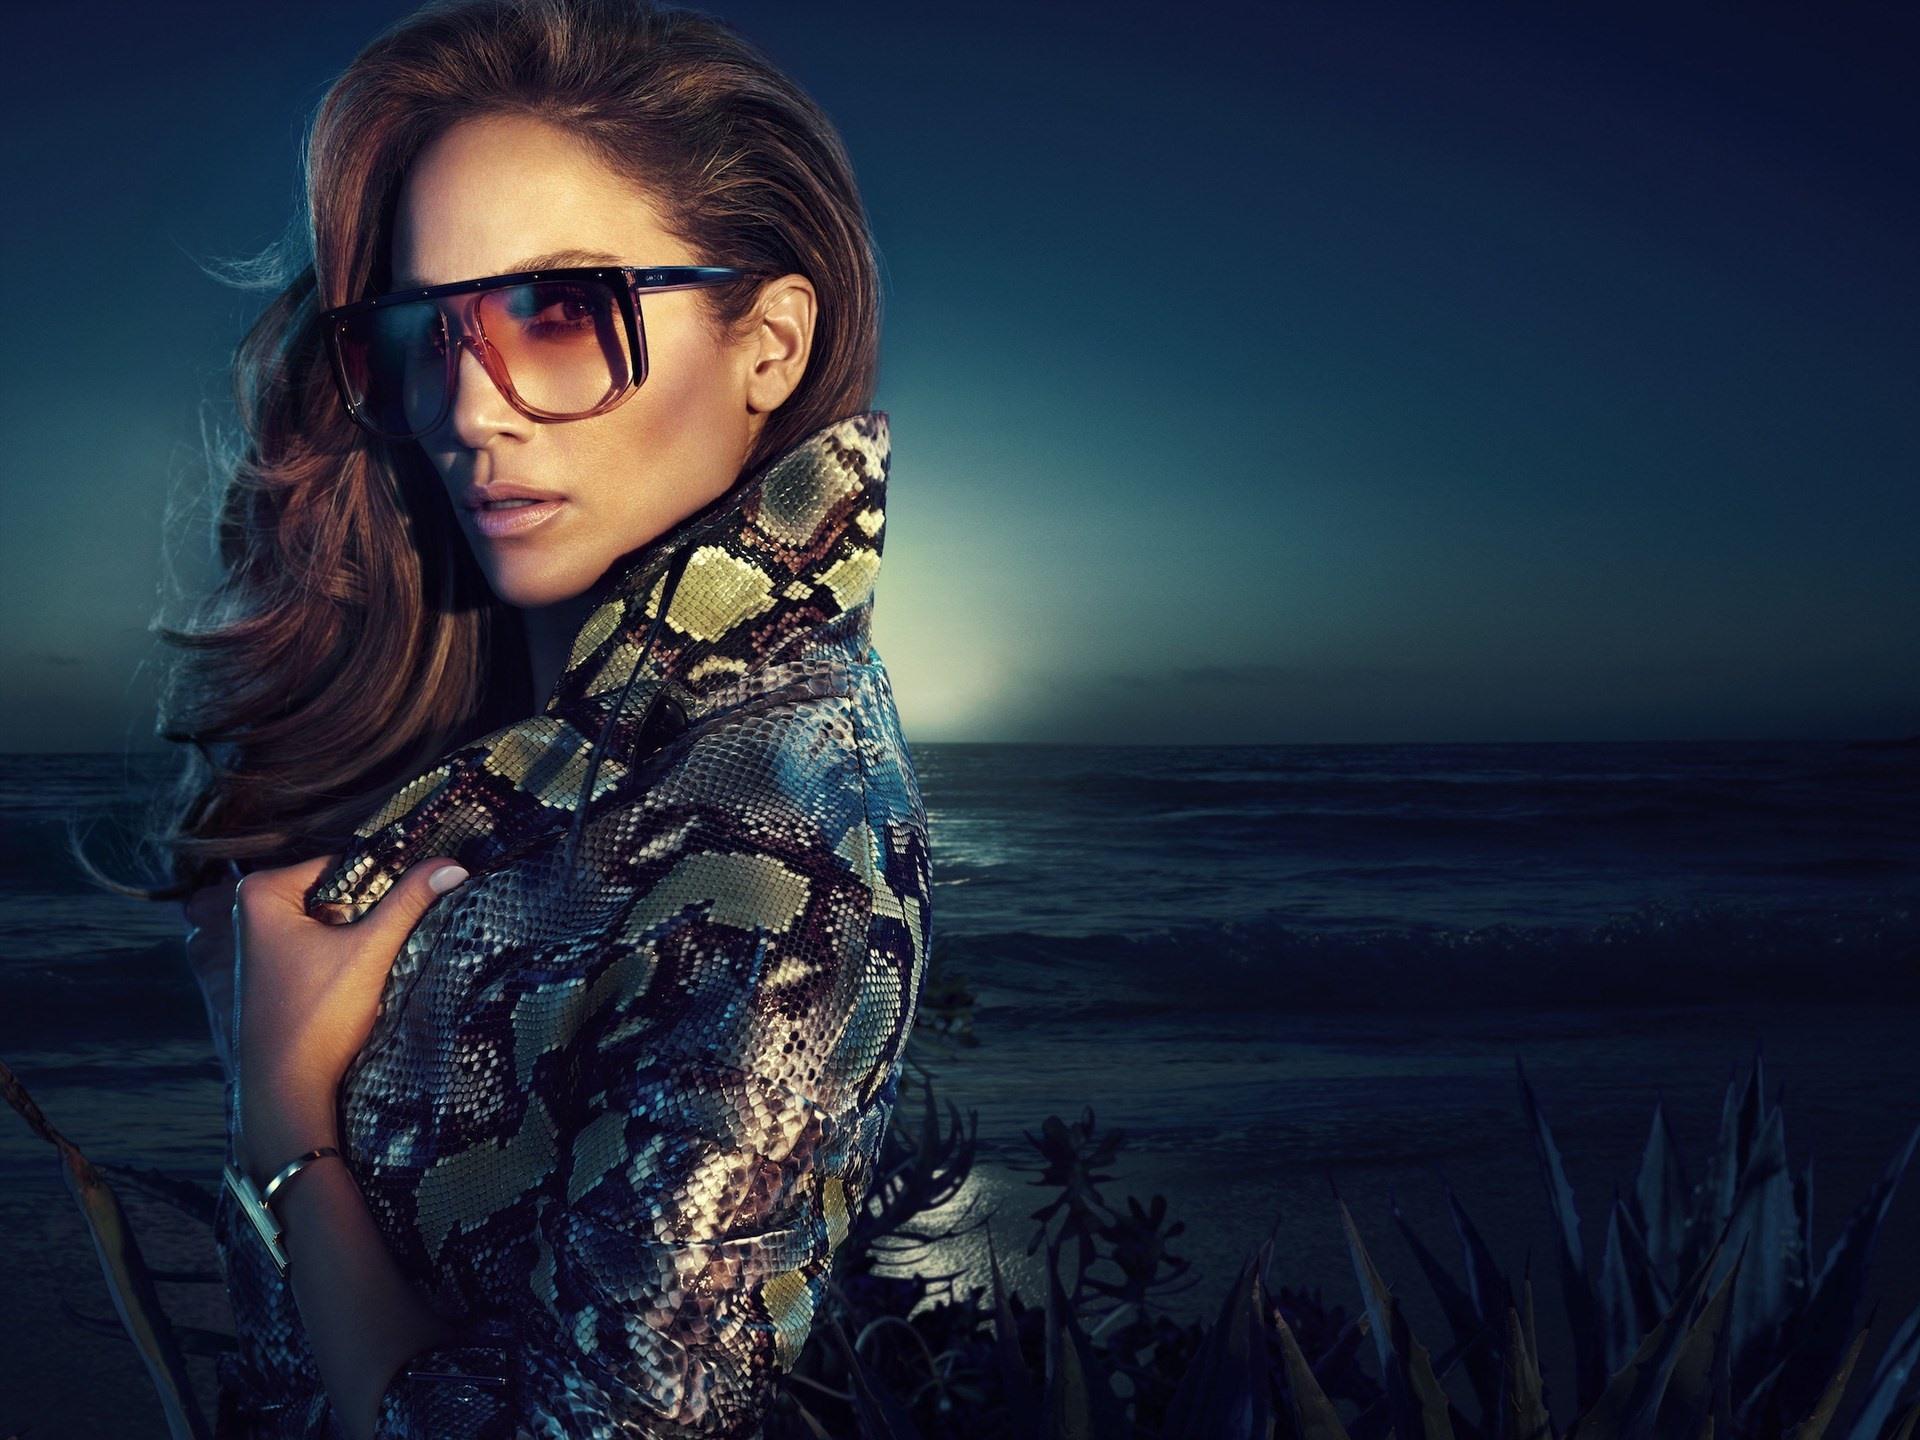 Fondos De Pantalla Jennifer Lopez 13 1920x1440 Hd Imagen